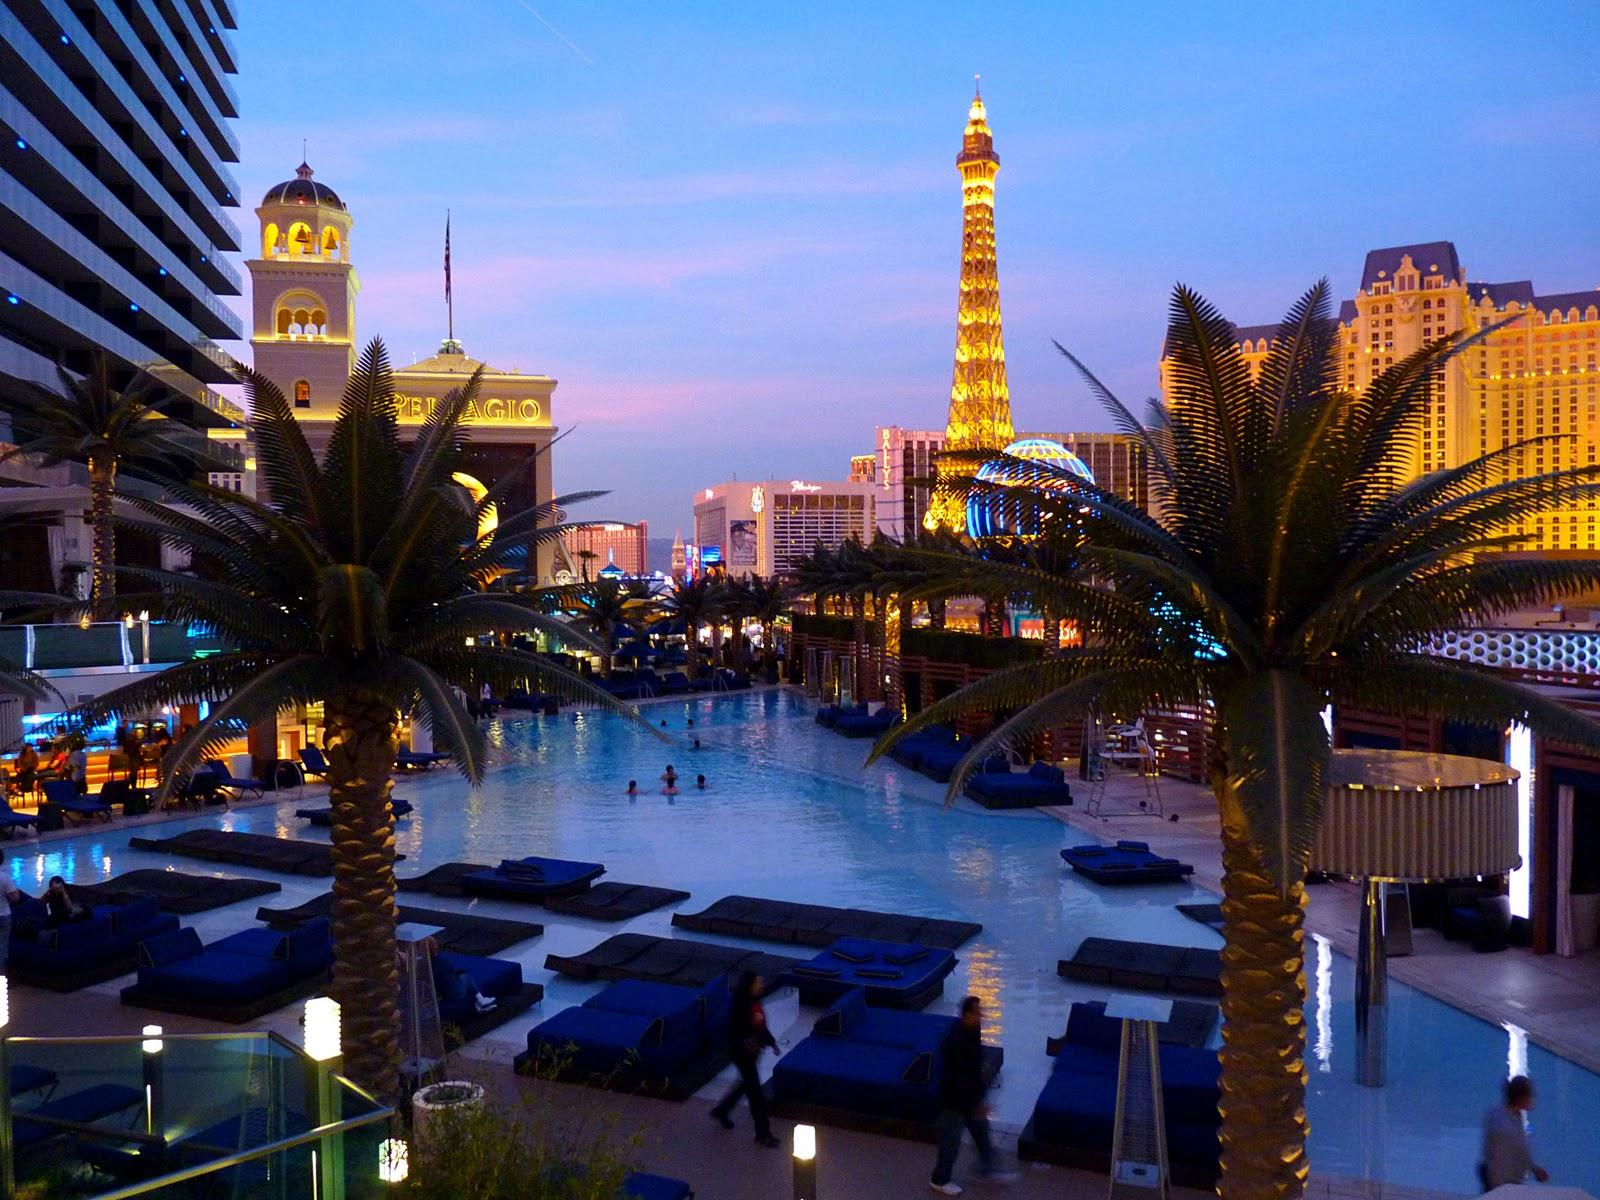 Enjoy Your Stay In Las Vegas In The Luxury Cosmopolitan